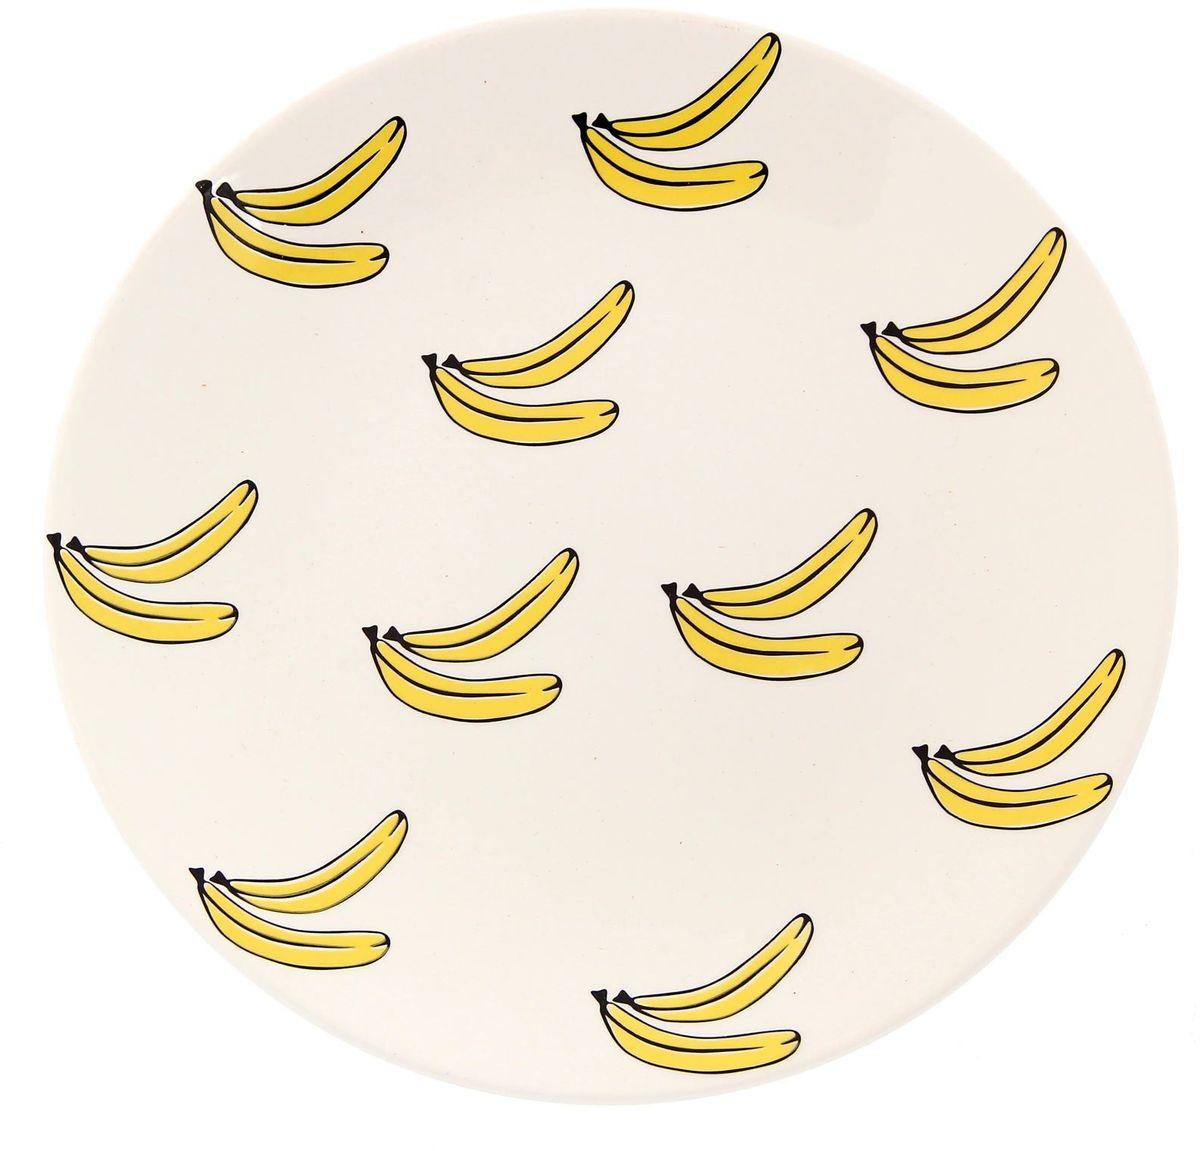 Тарелка Сотвори чудо Бананы, диаметр 22 см